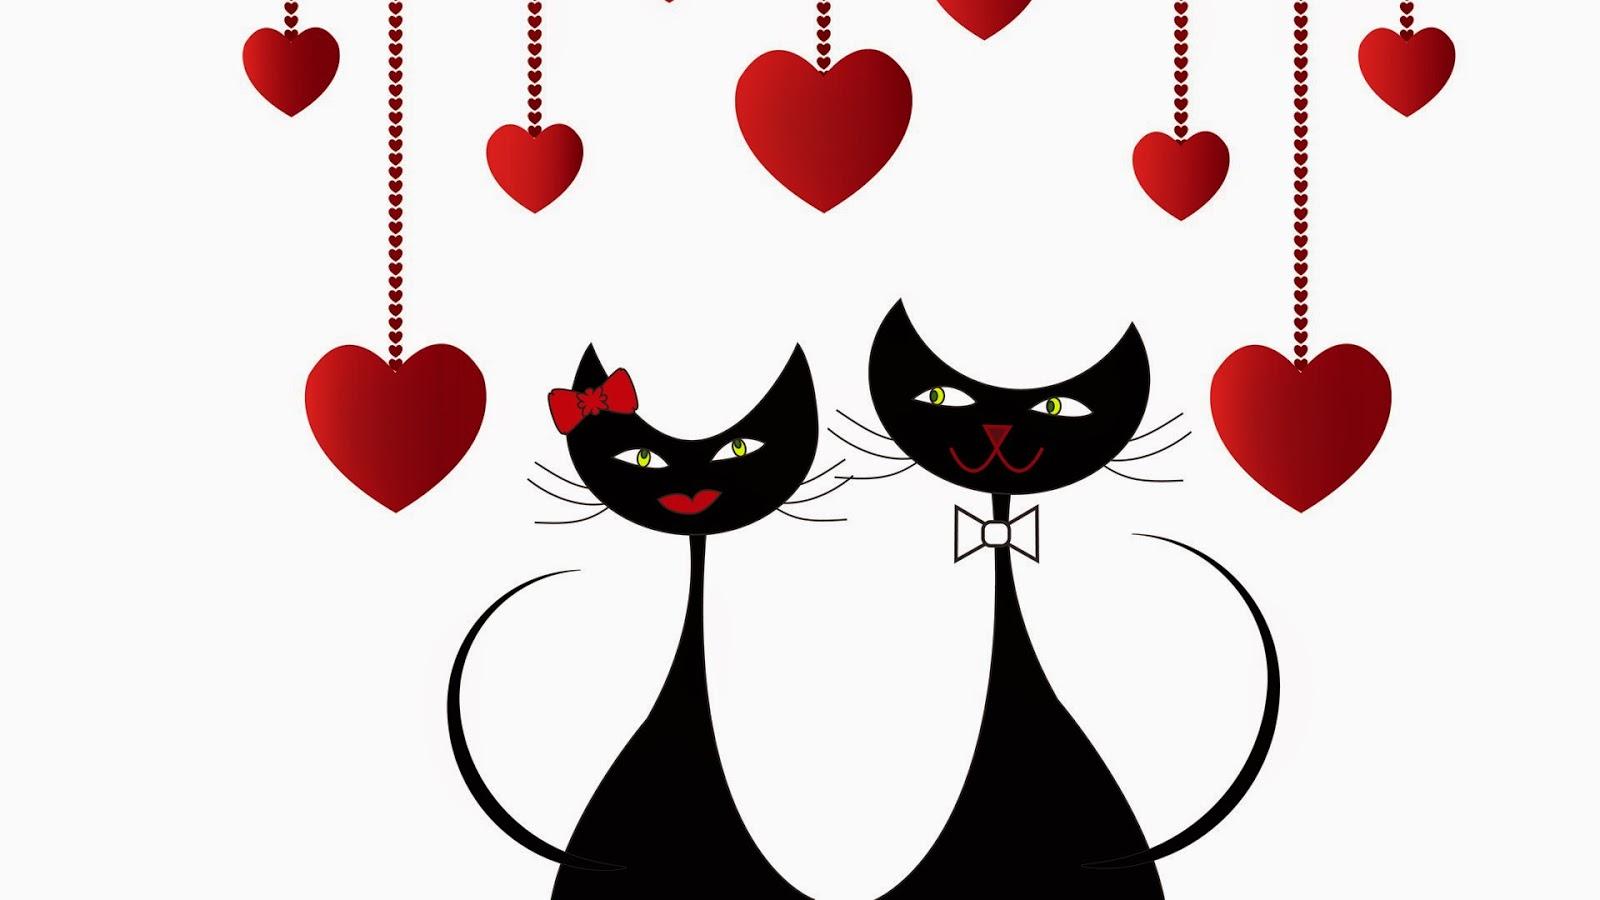 Ten Lives Club Cat Adoption Group SWEET VALENTINE BASKET RAFFLE 1600x900